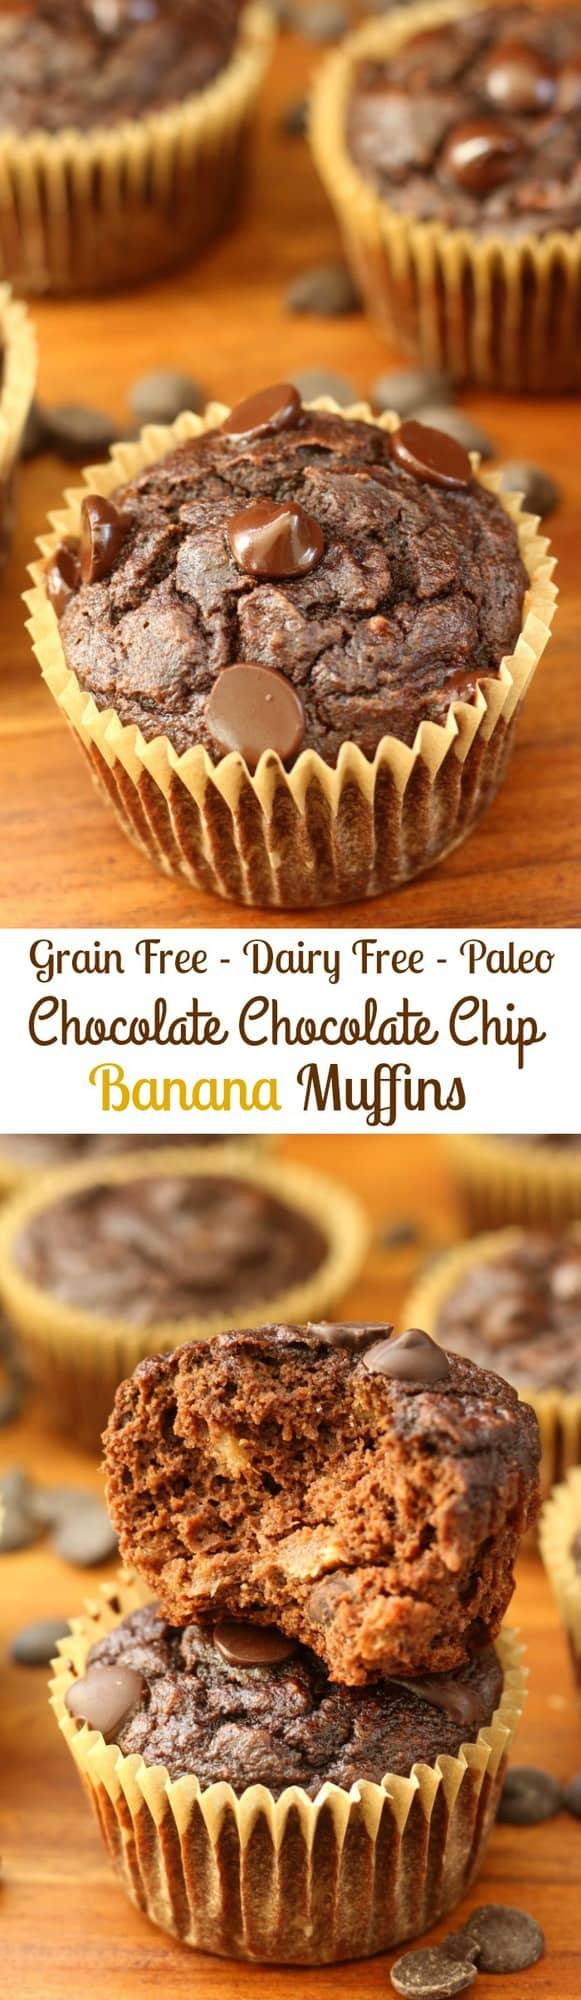 Chocolate chocolate chip banana muffins - grain free, dairy free, paleo, healthy!